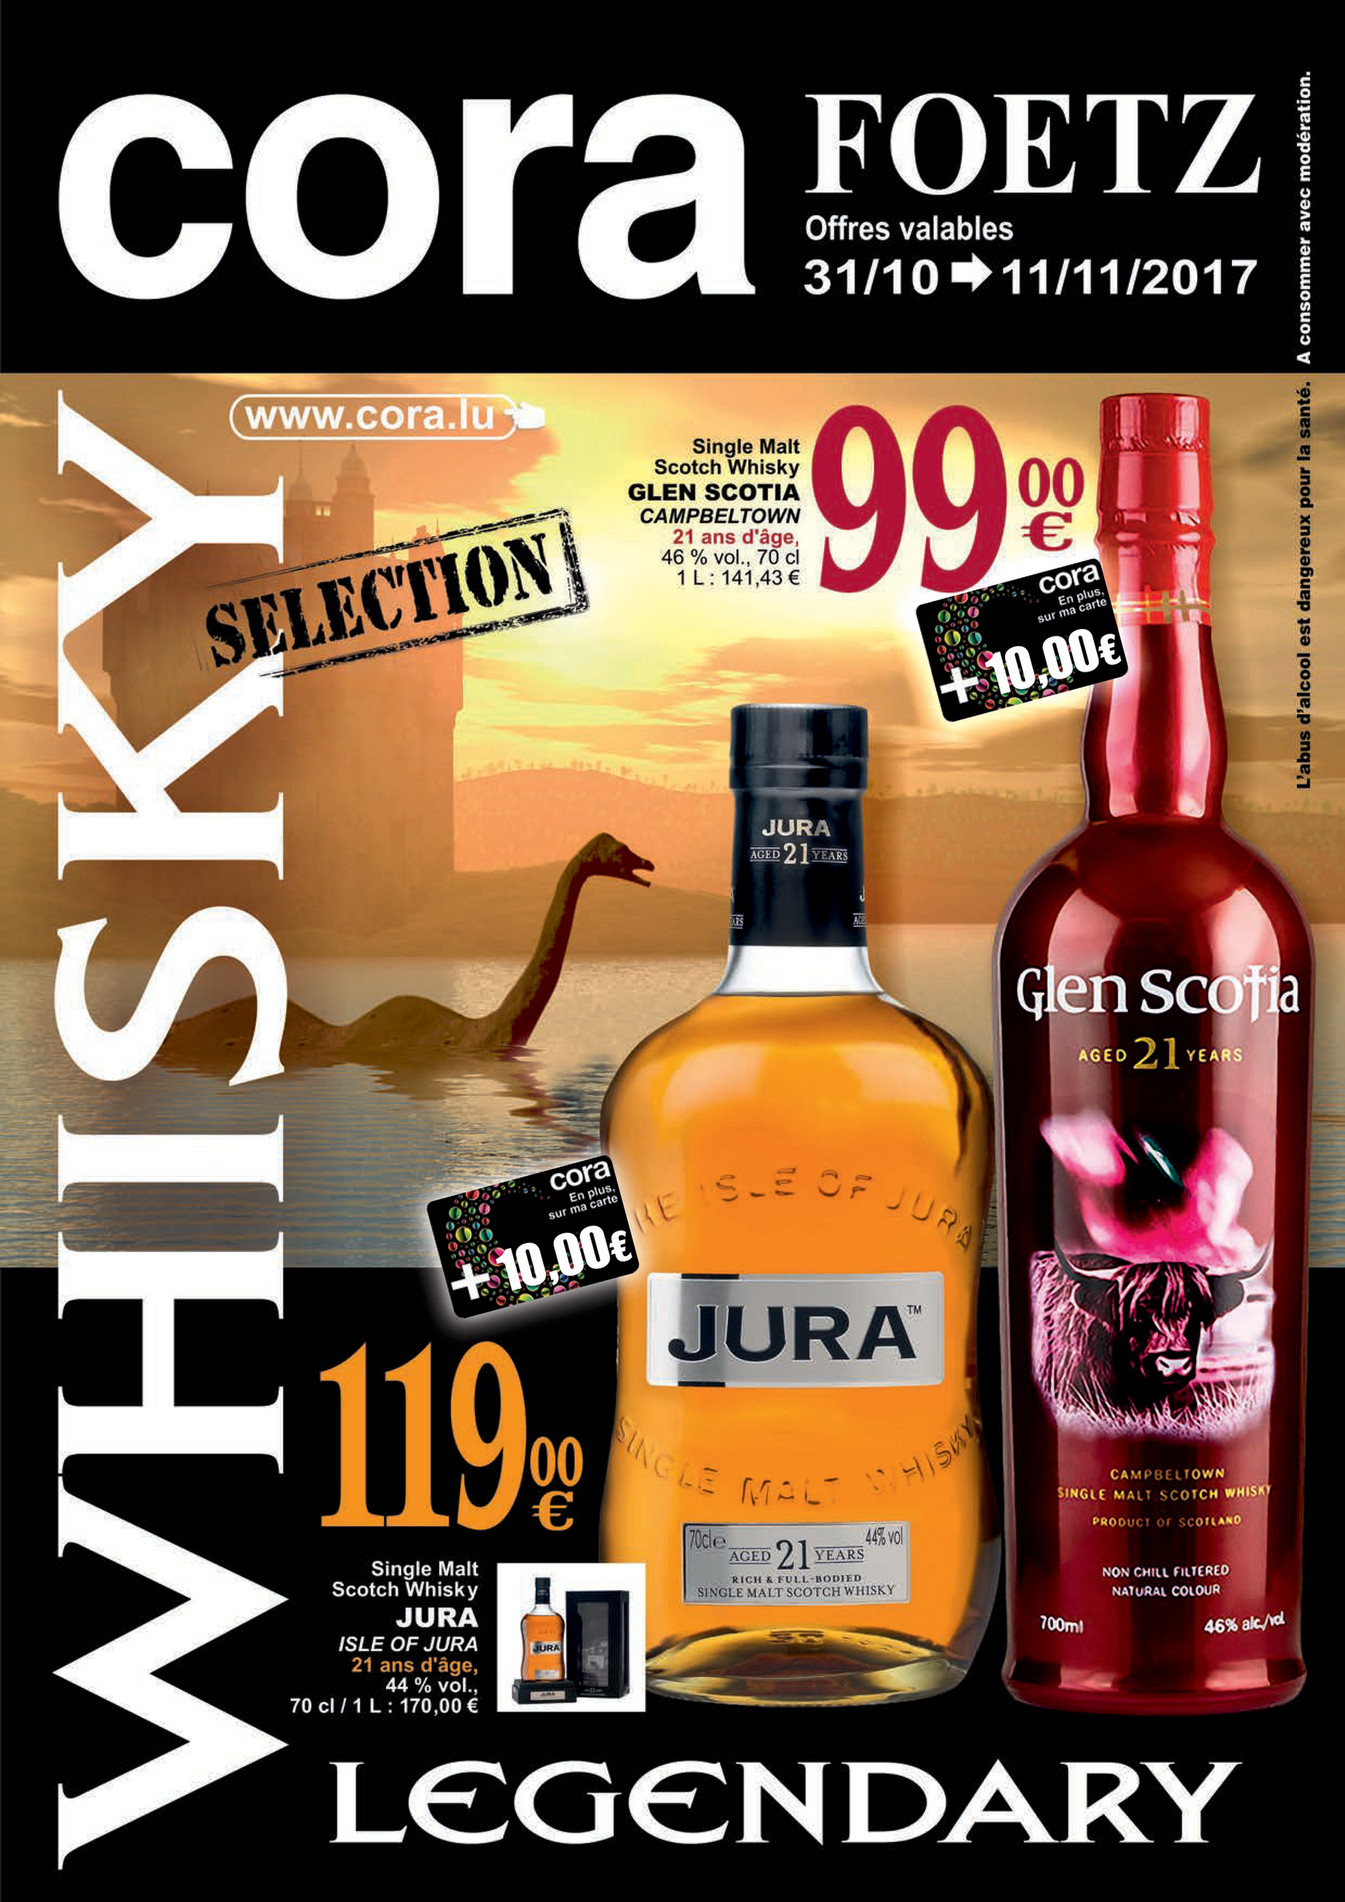 Carte Cora Essence.Cora Foetz Whisky Du 31 10 17 Page 6 7